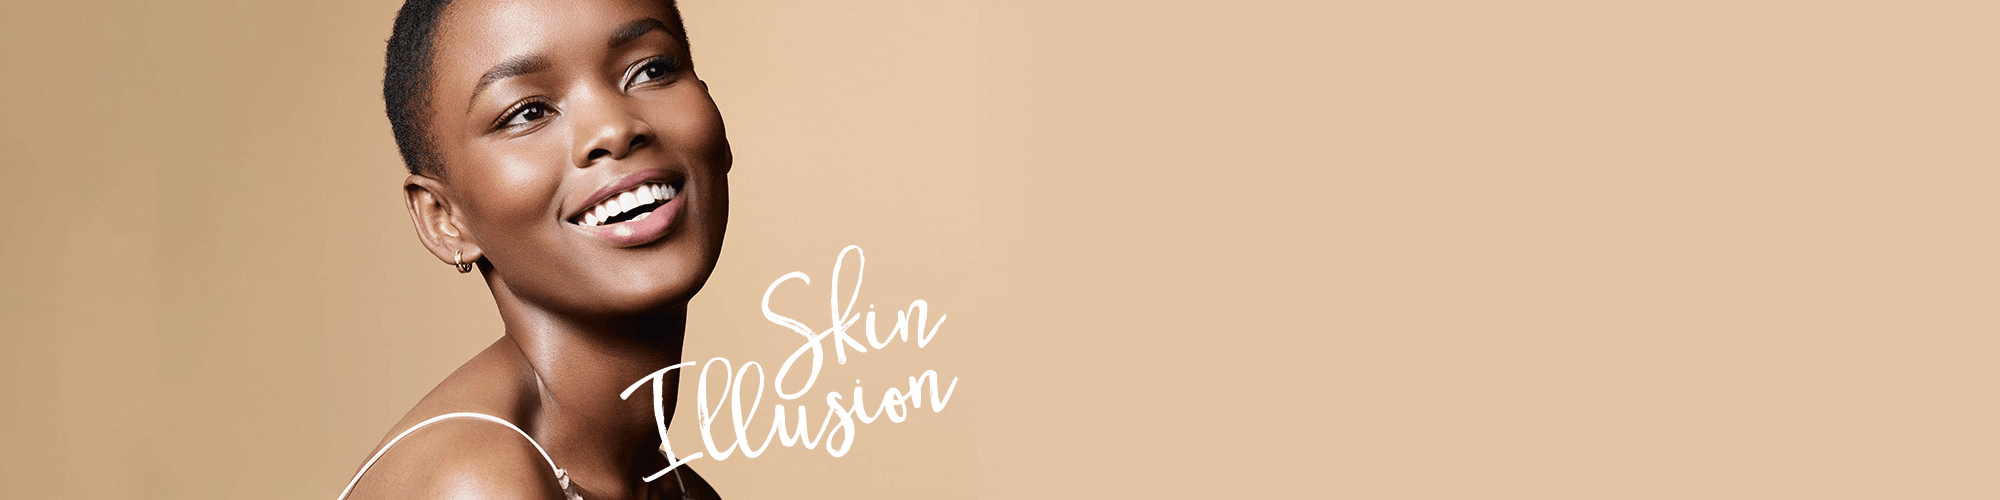 Black model wearing Skin Illusion foundation